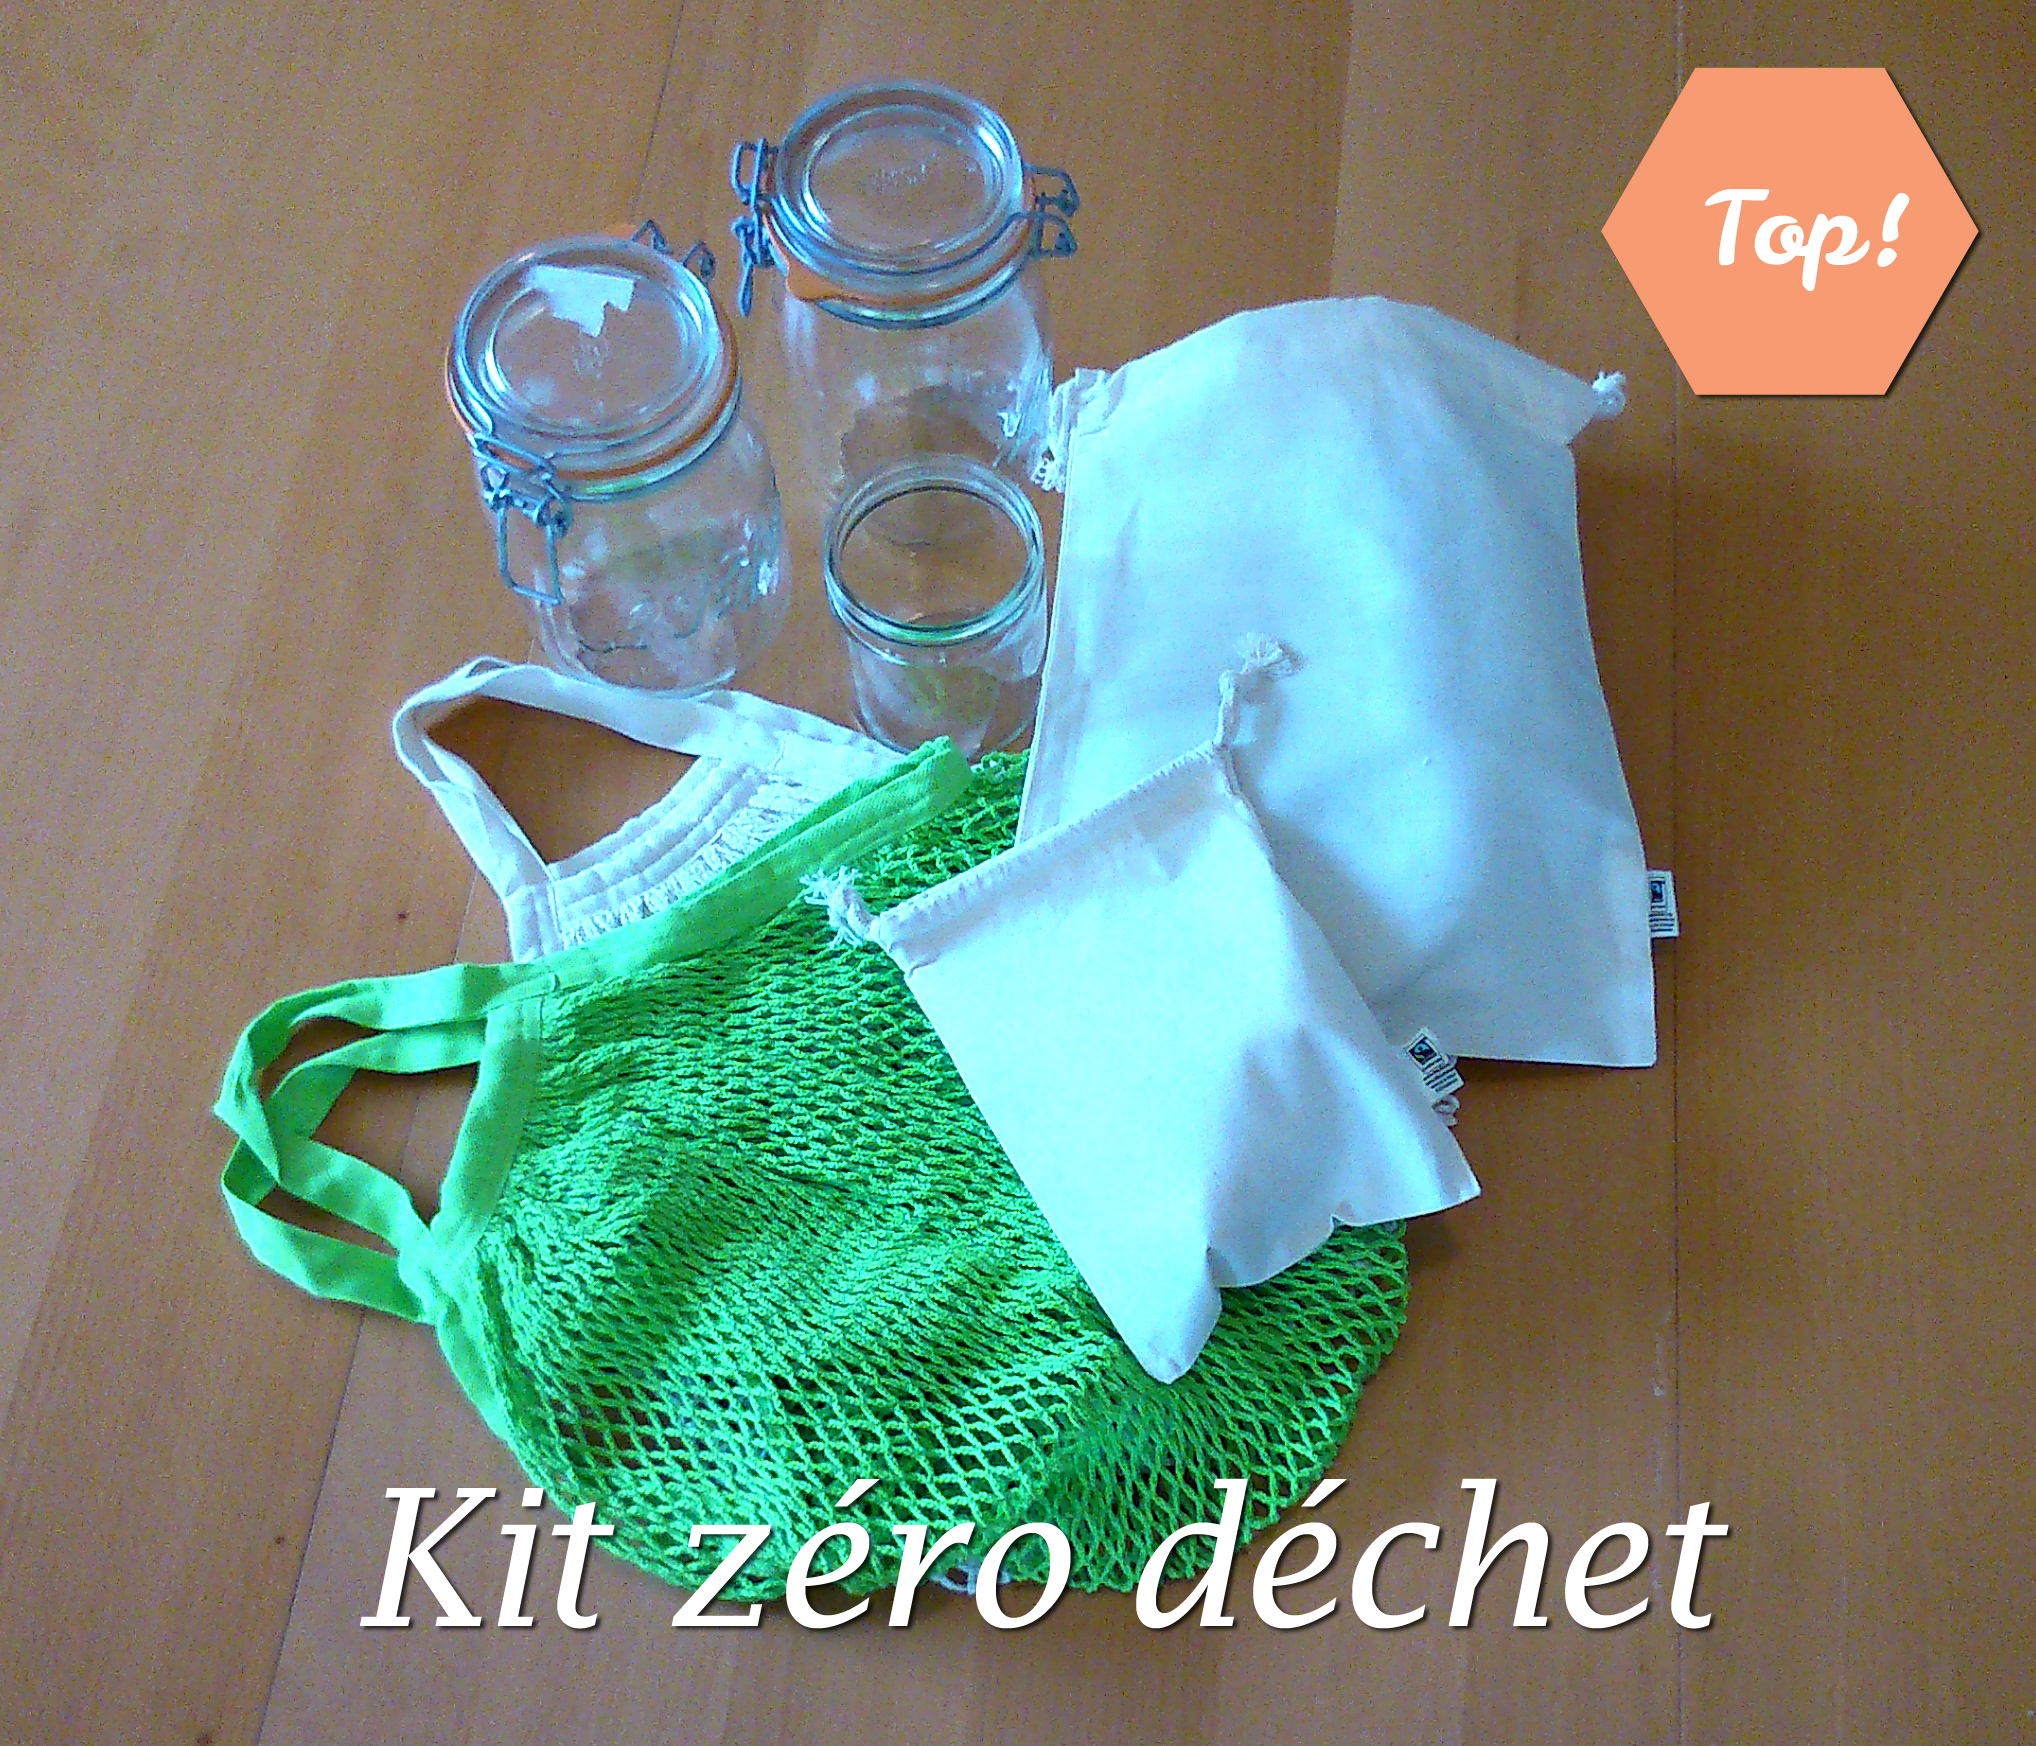 kit zero dechets